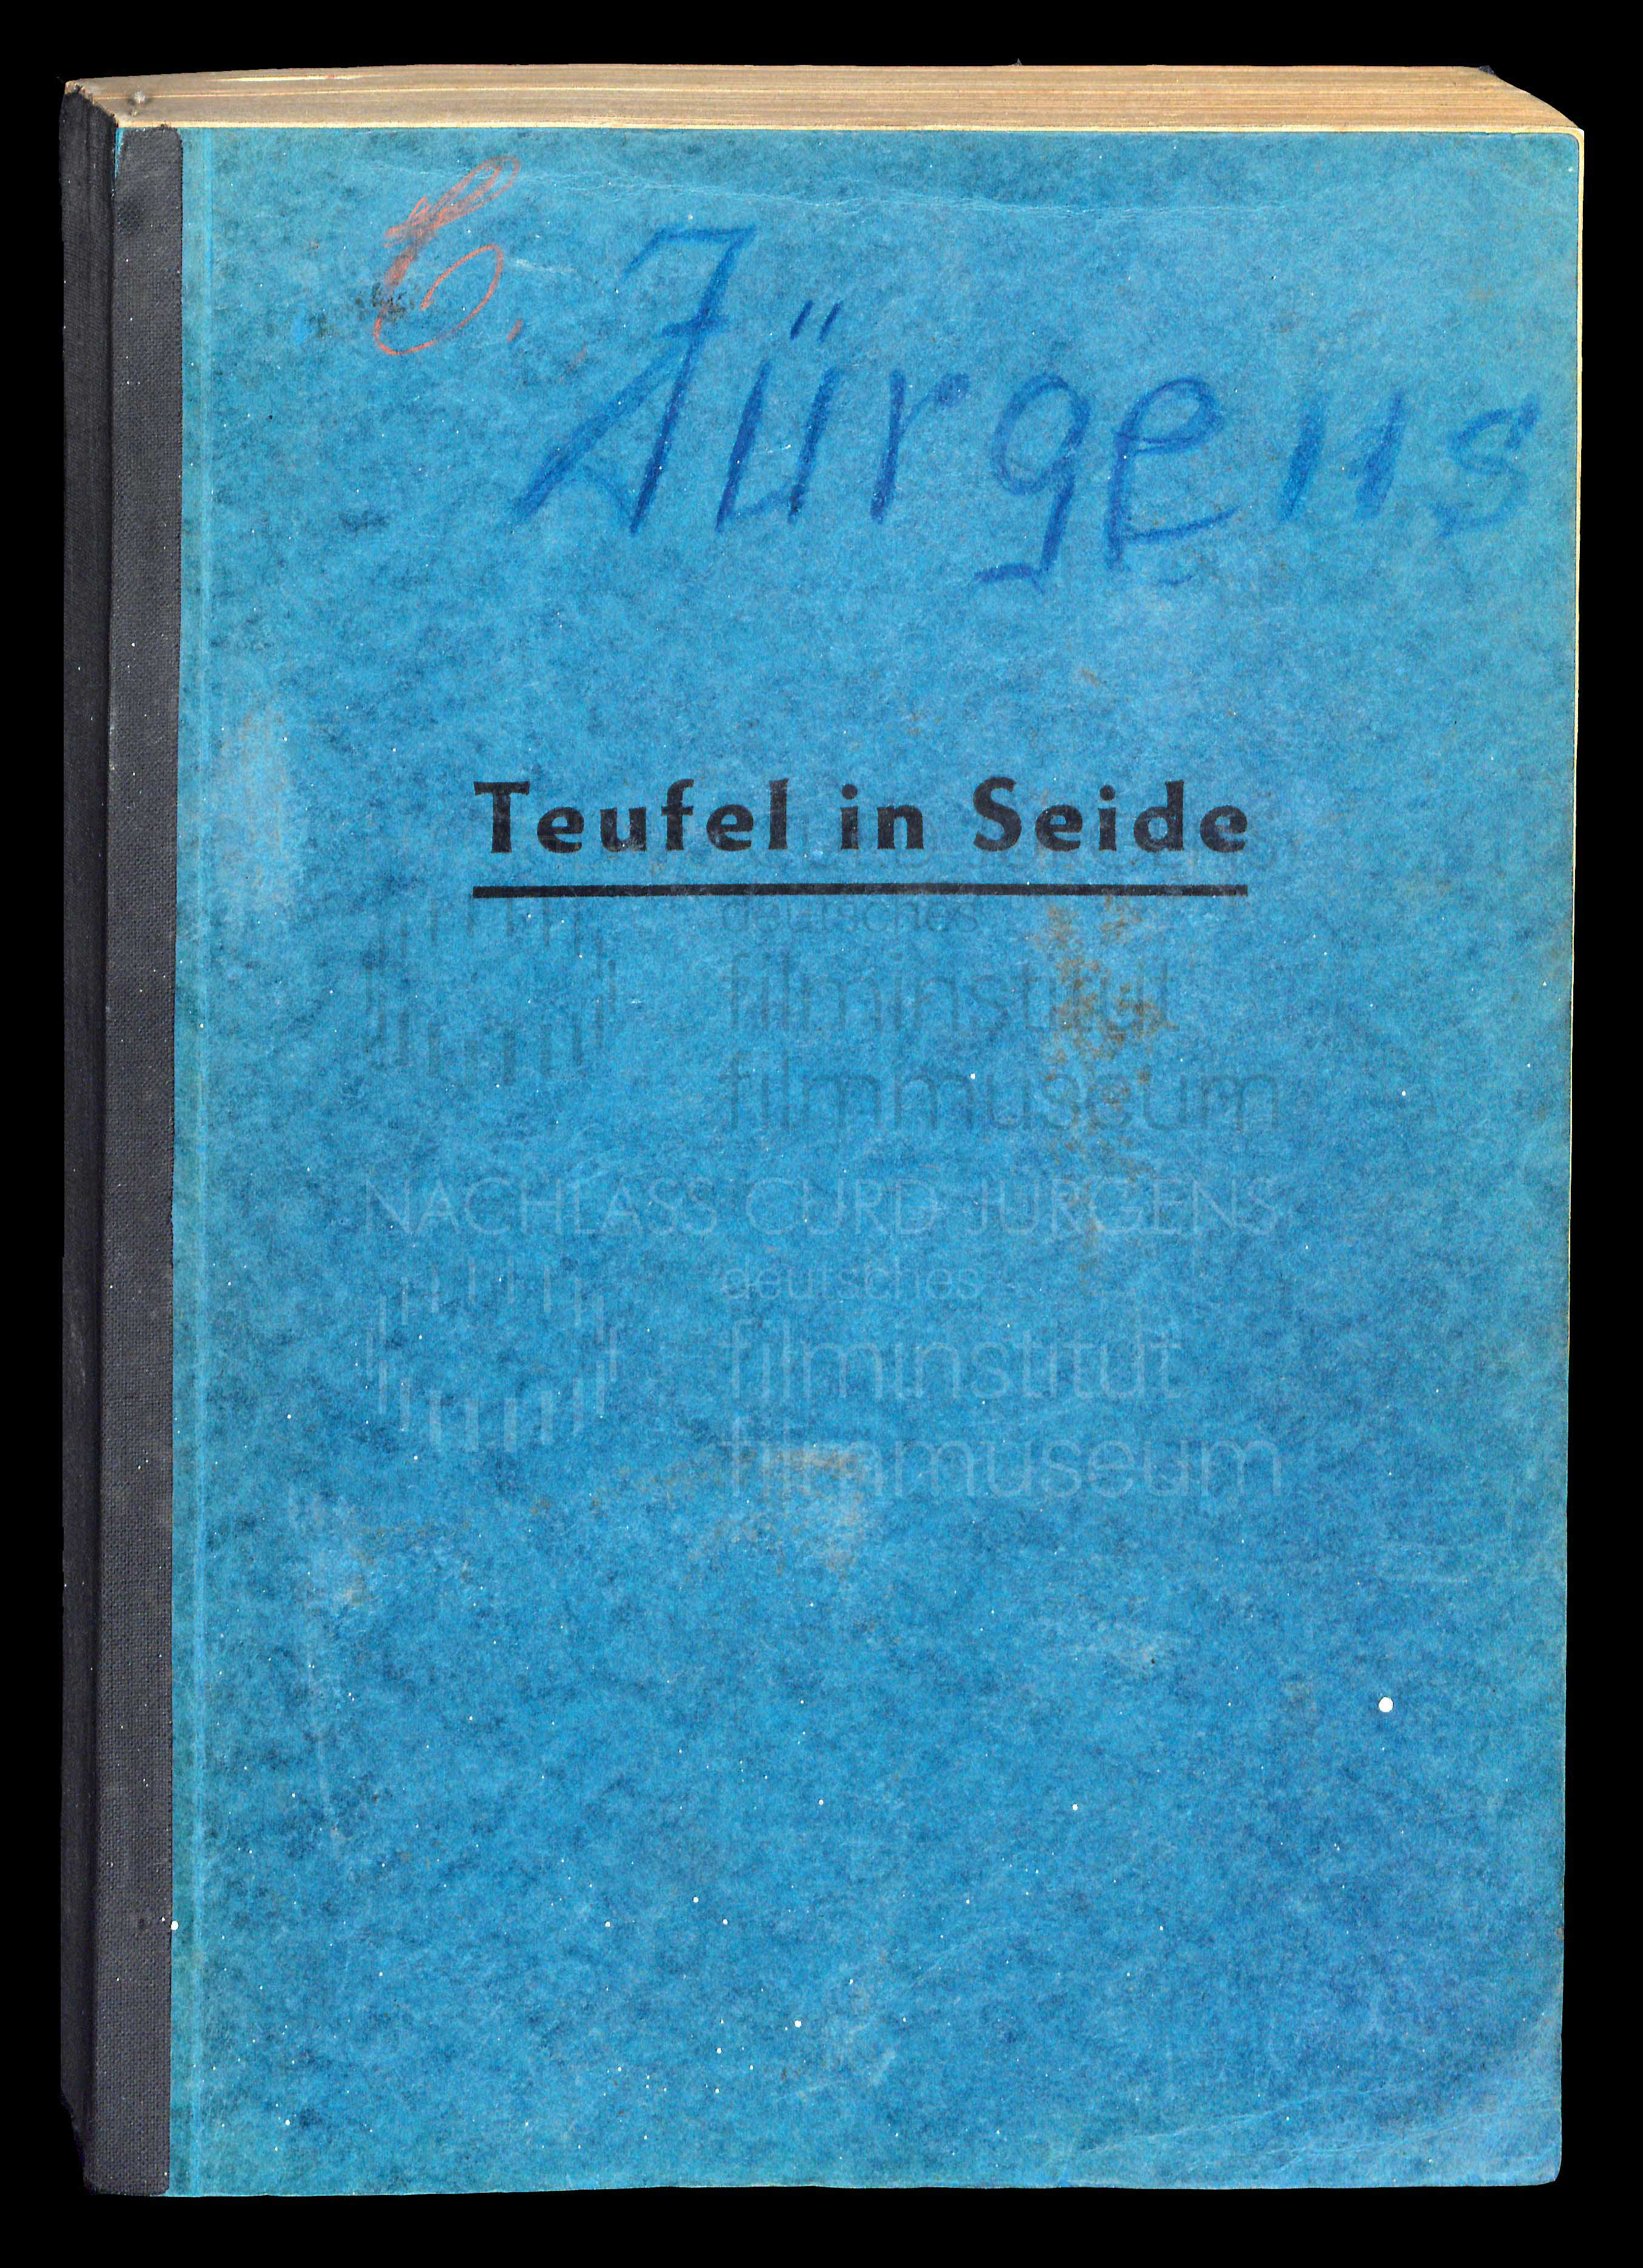 TEUFEL IN SEIDE (1956) Drehbuch (Auszug) 1